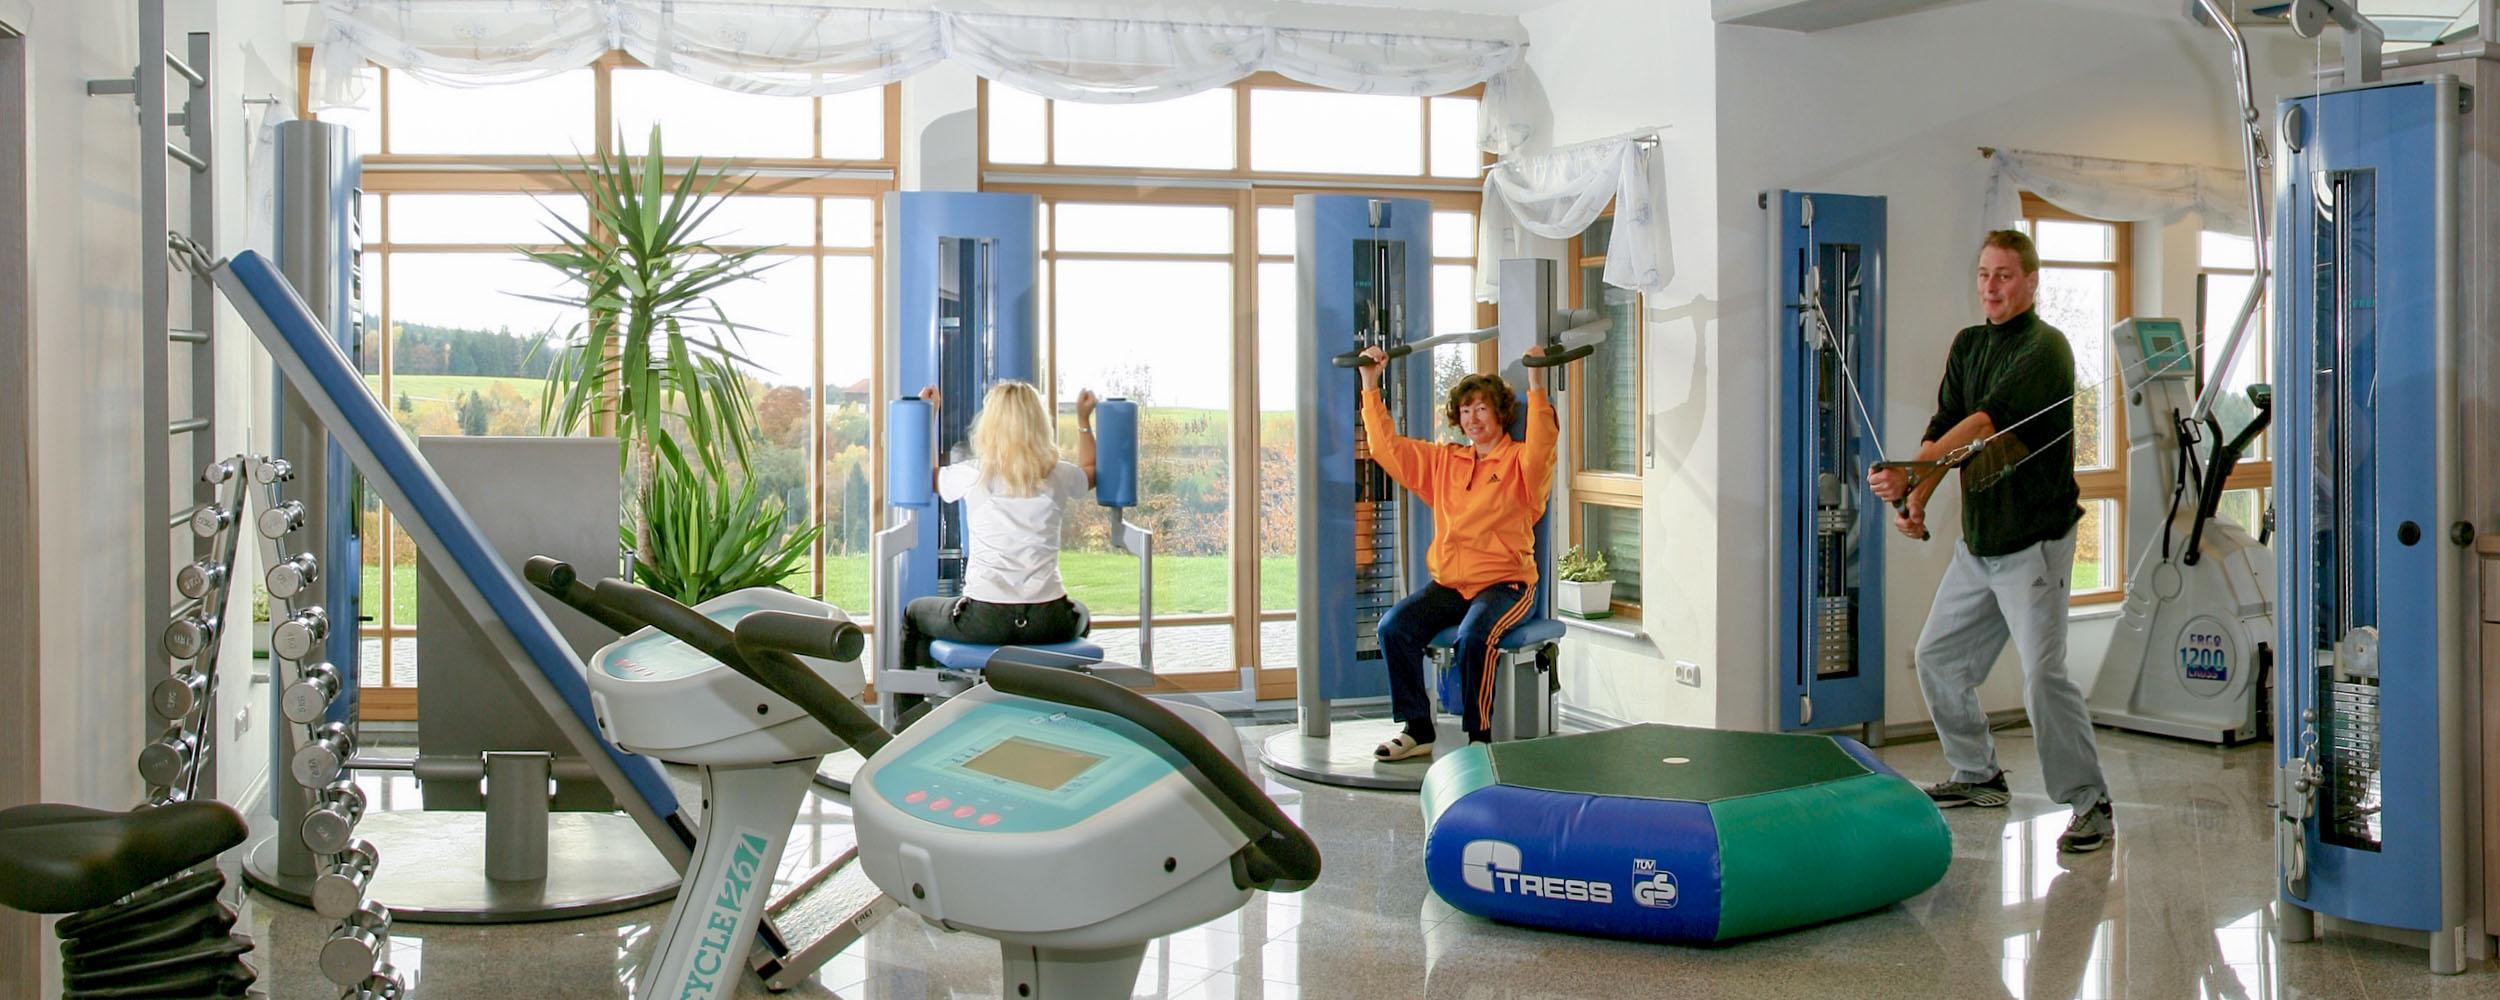 Fitnessstudio im HAUSER HOF